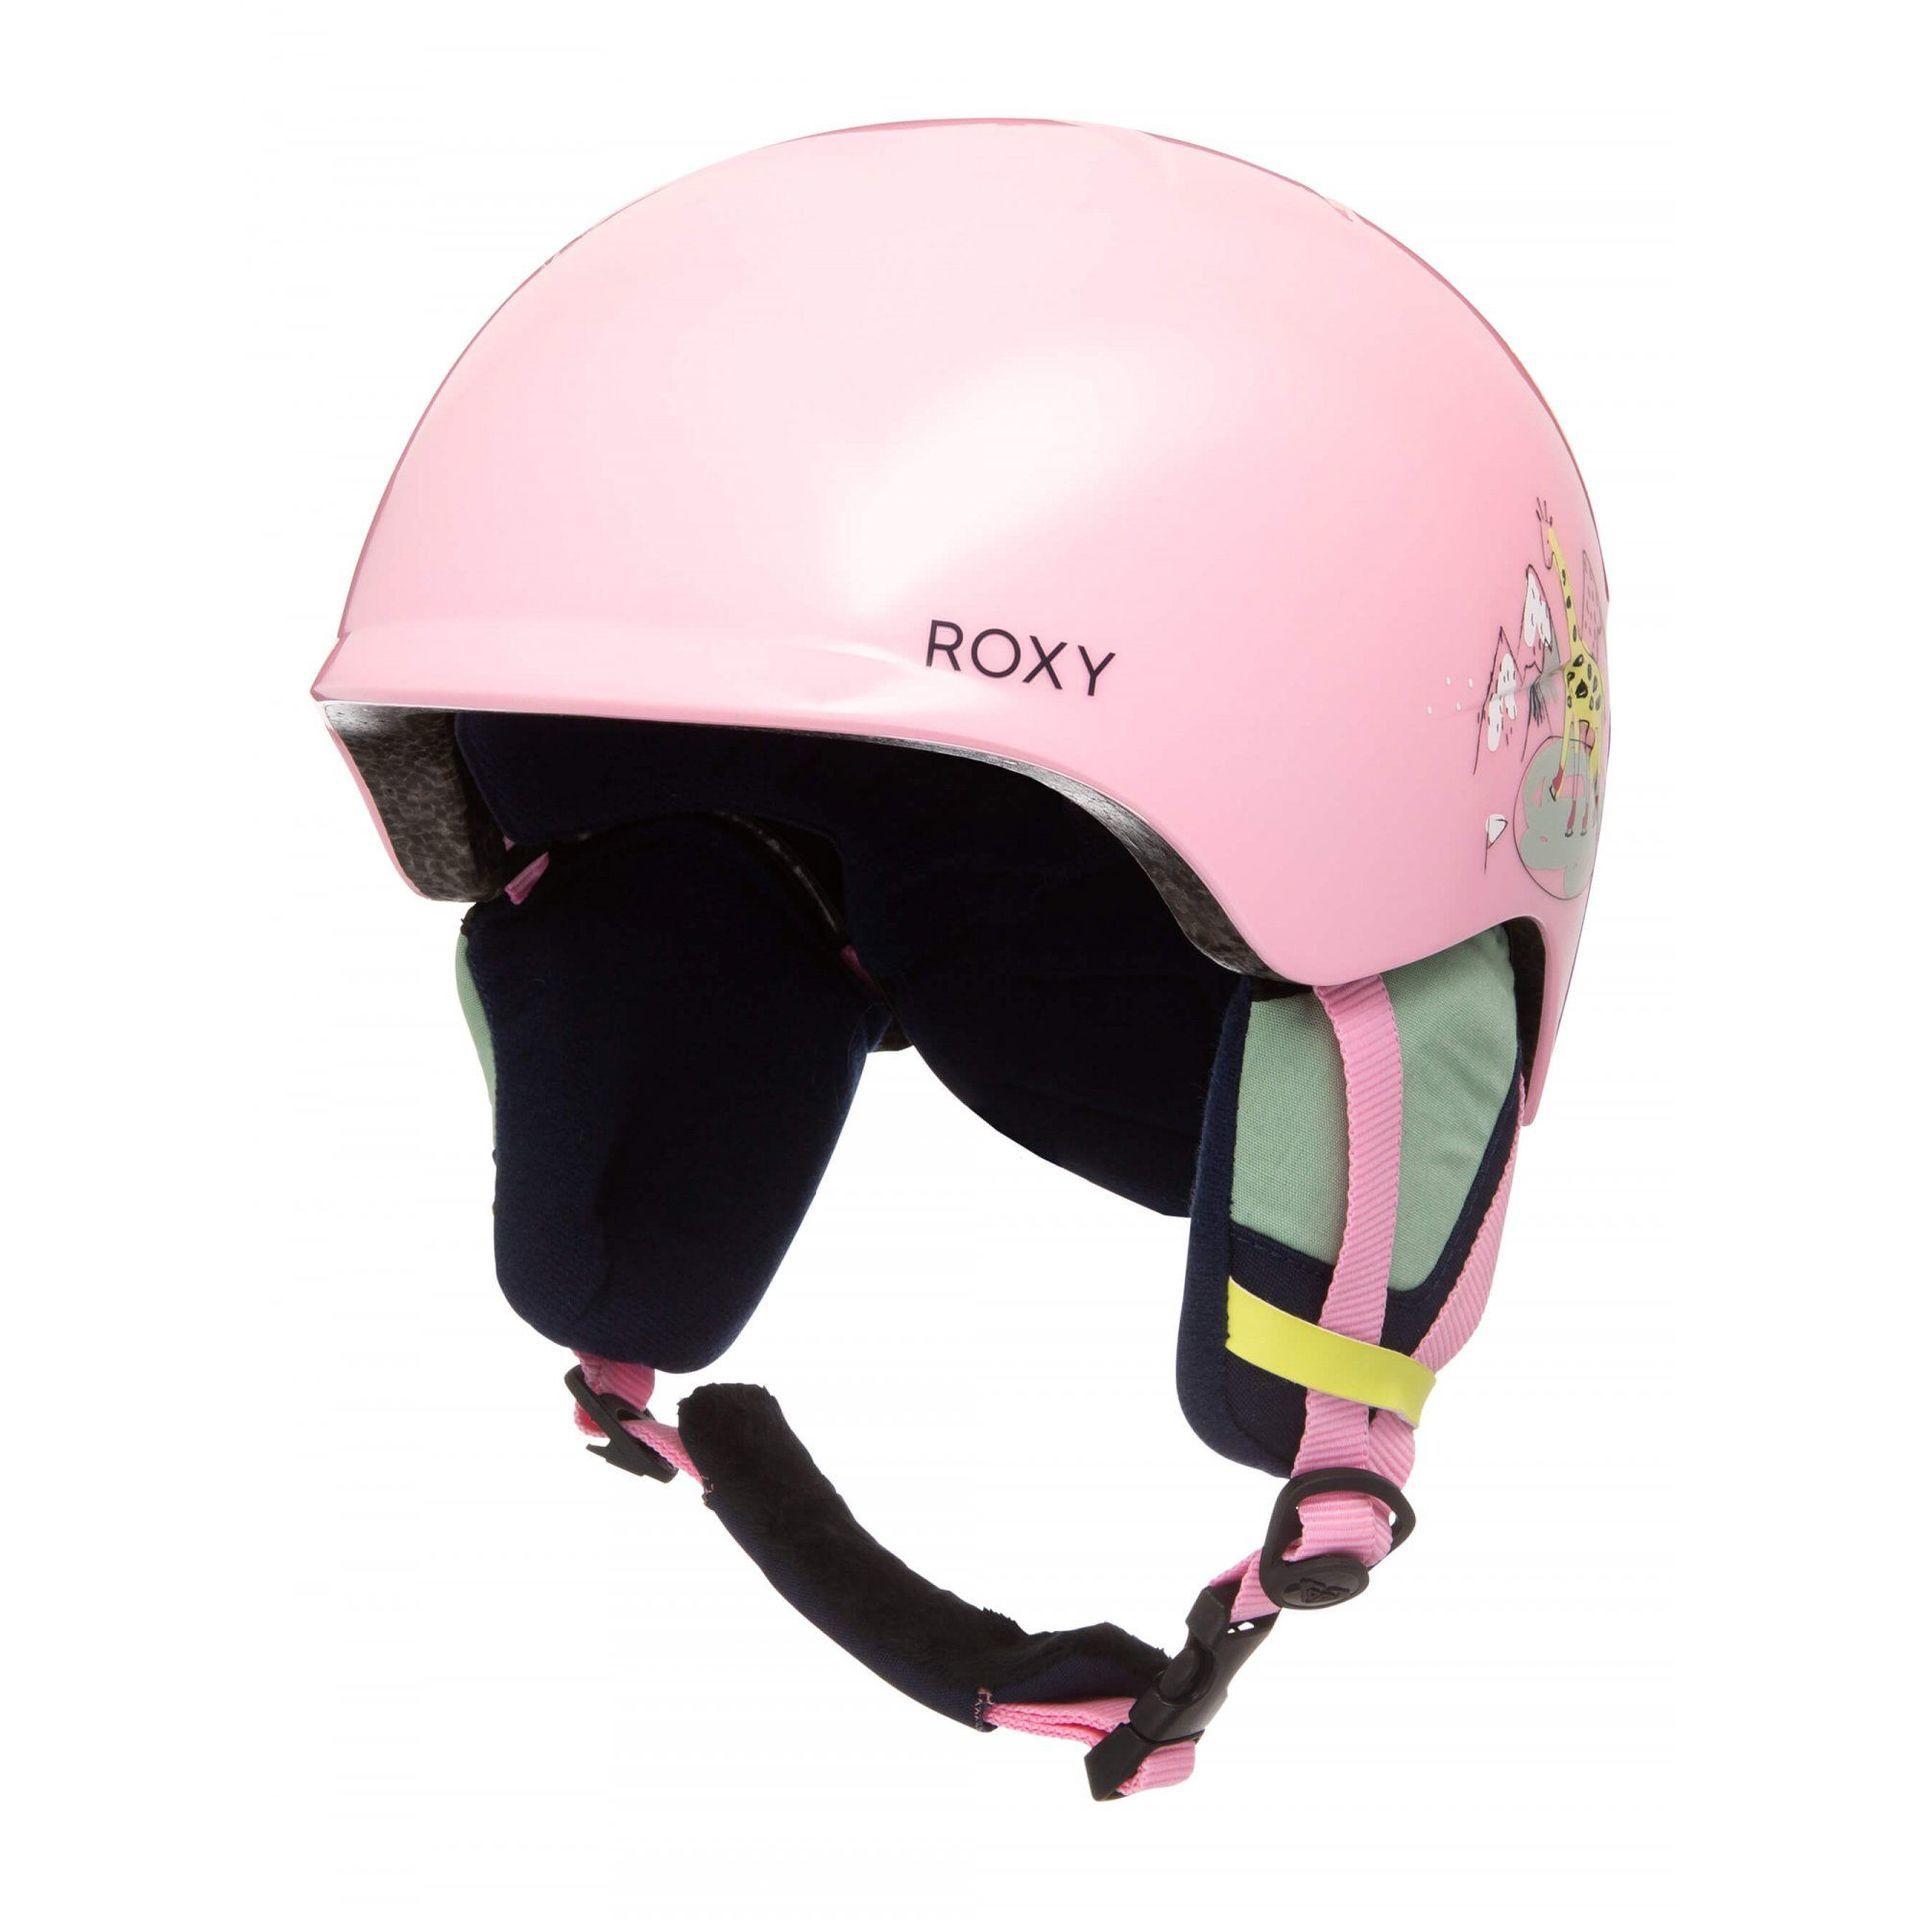 KASK ROXY SLUSH ERGTL03014-MEQ1 SNOW TRIP 1